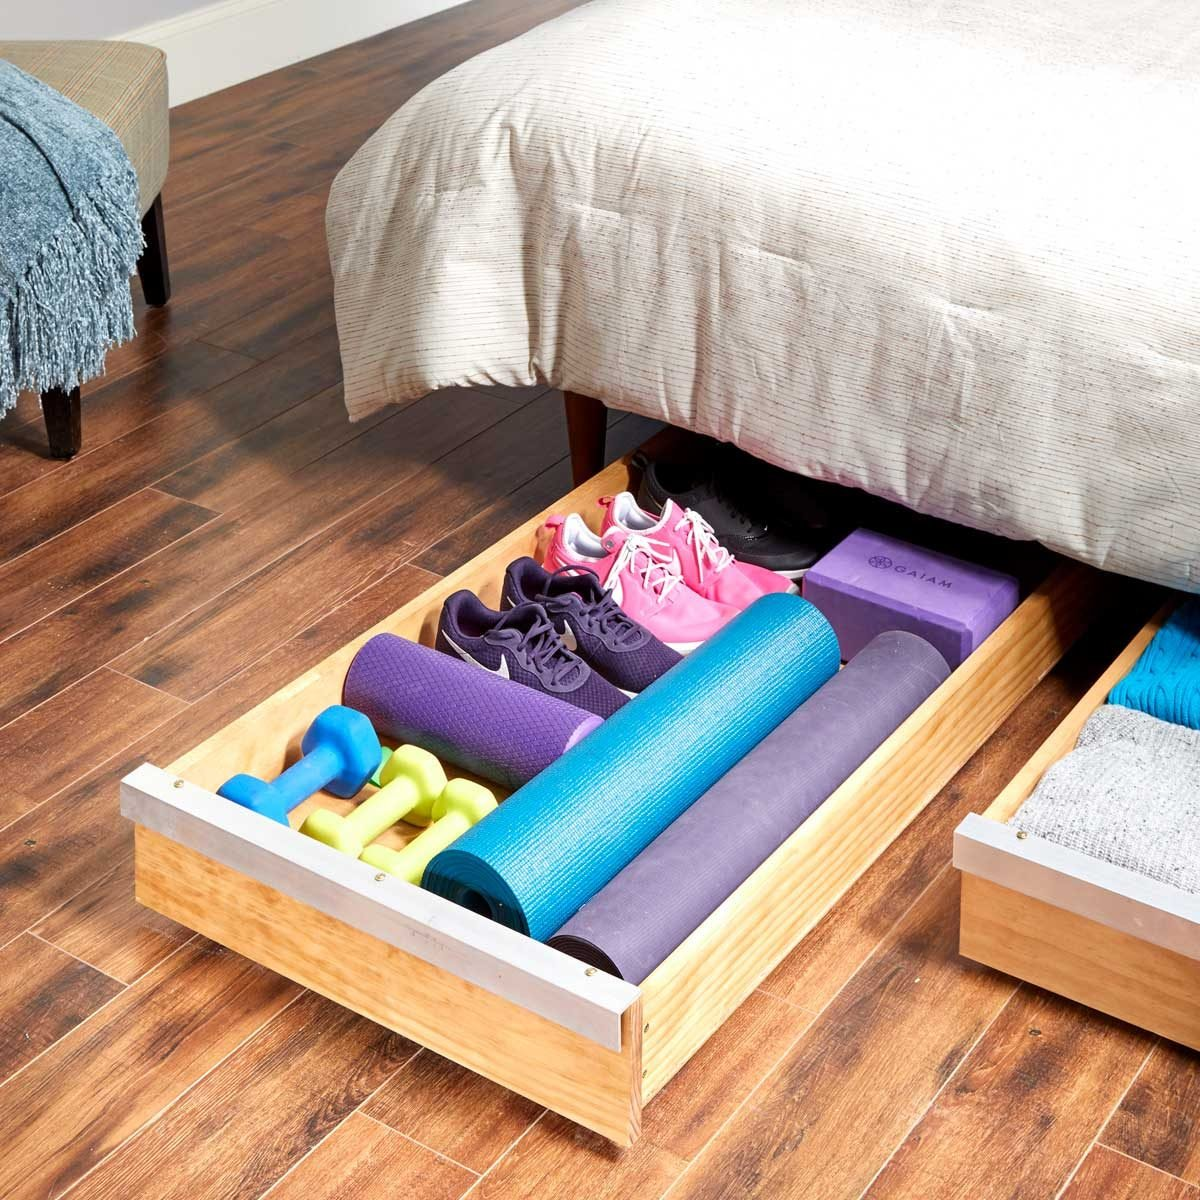 How to Make a DIY Under-Bed Storage Drawer